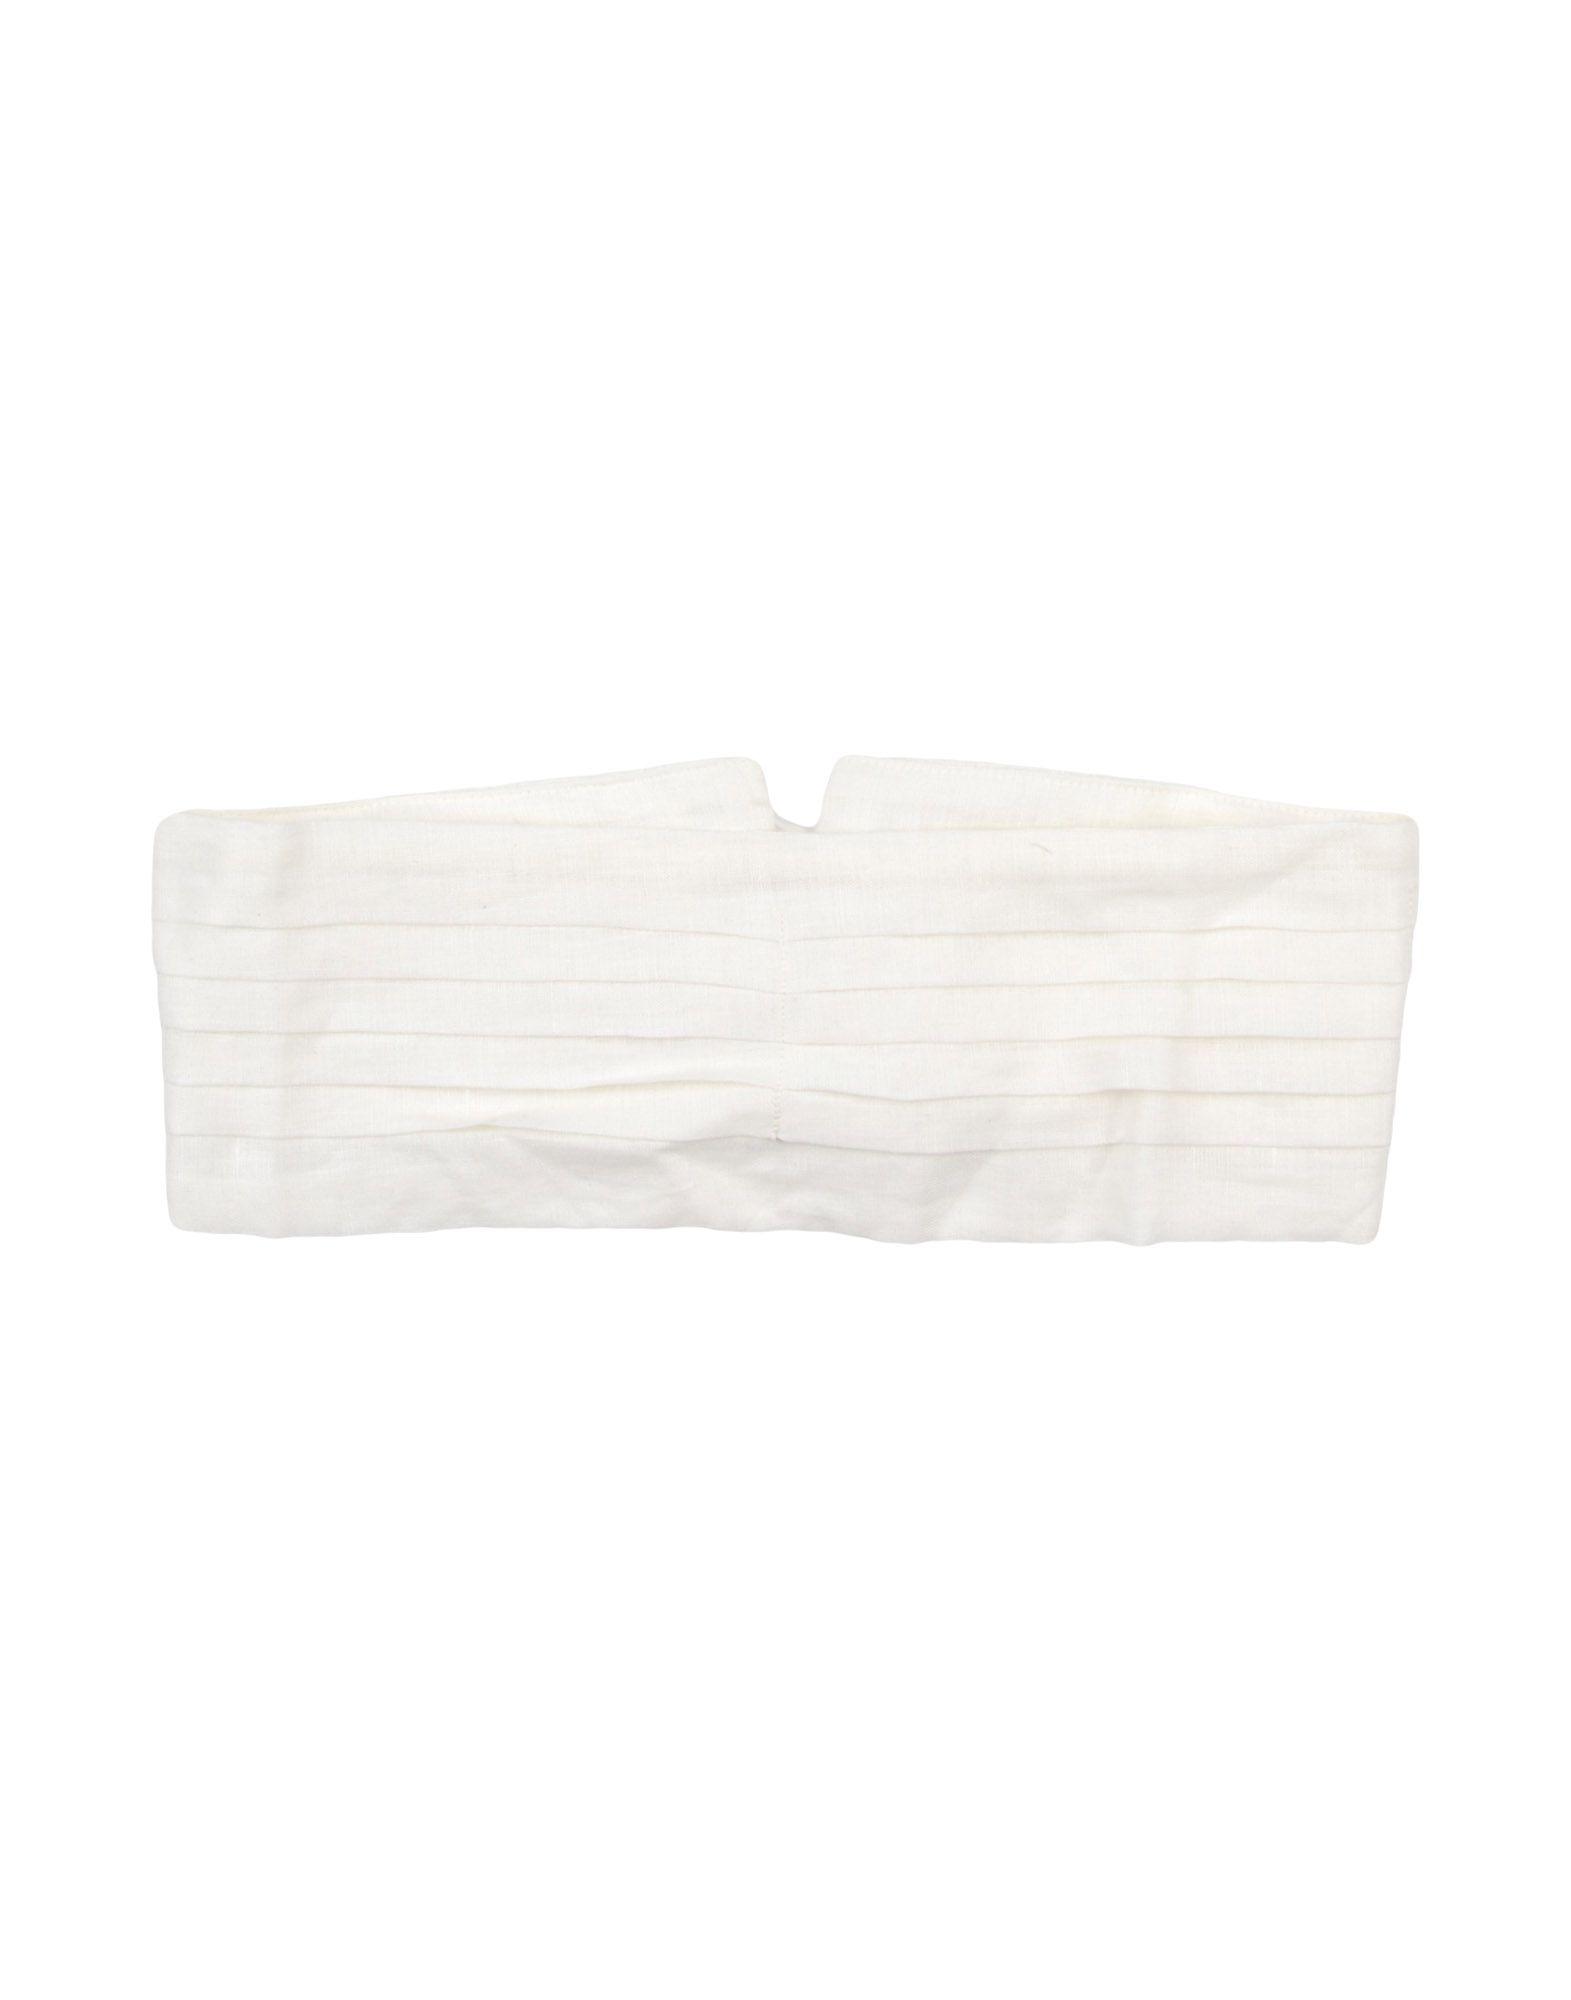 BLACK CRANE Fabric Belt in White